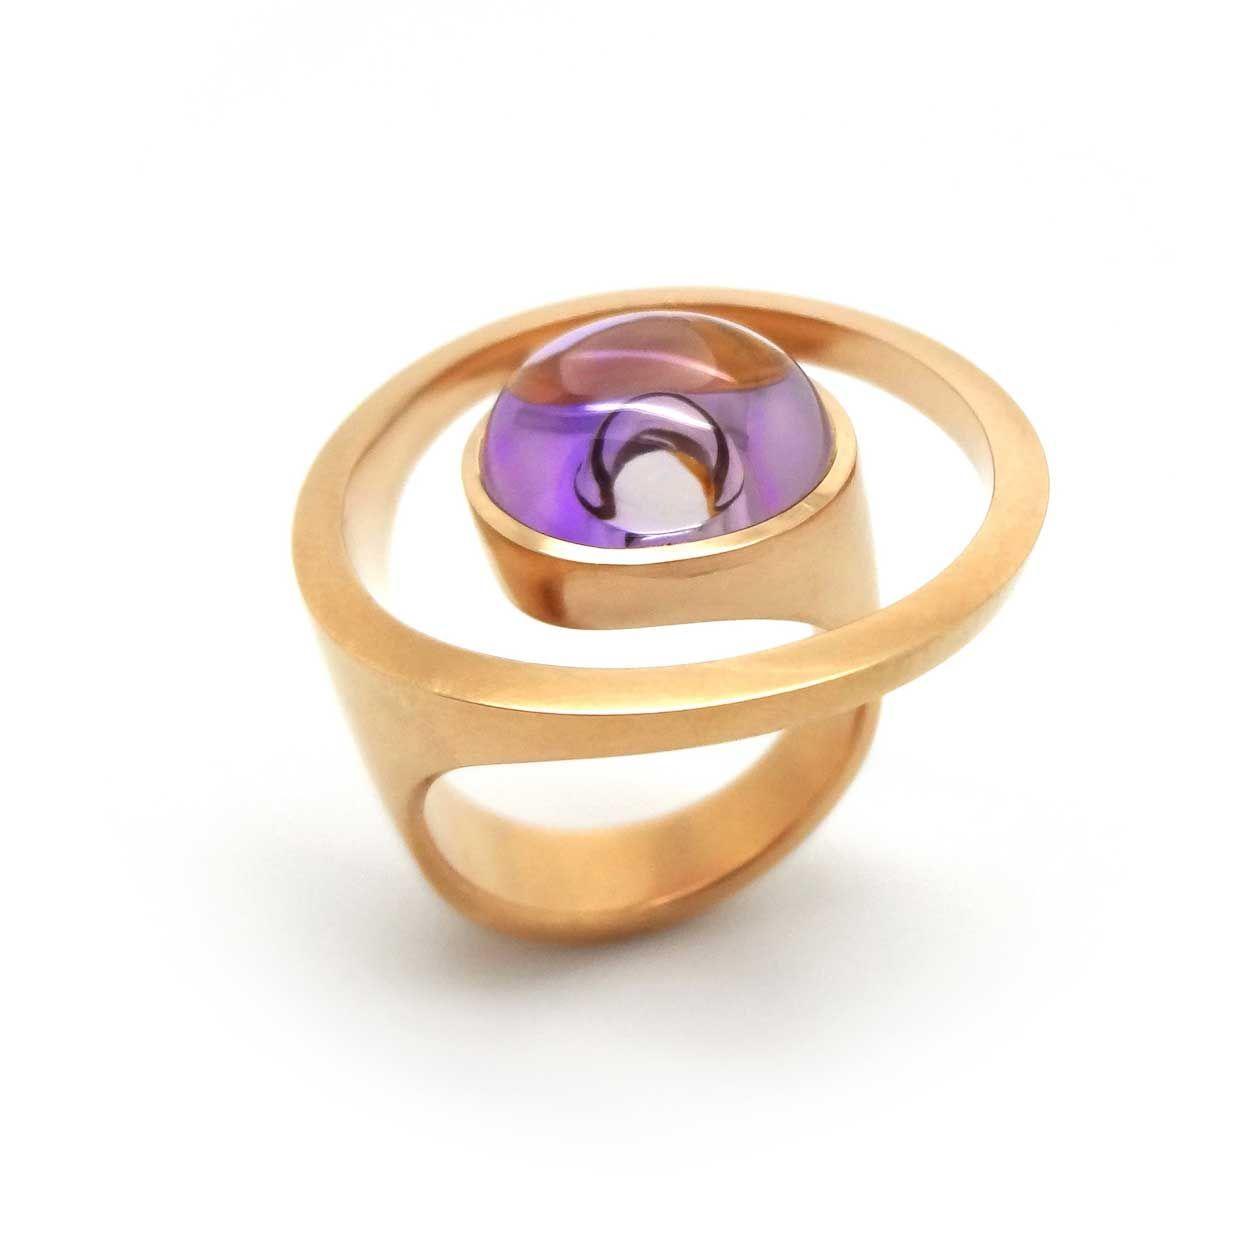 Stunning ORRO Contemporary Jewellery Glasgow Angela Hubel Rose Gold u Amethyst Magic Sunshine Ring